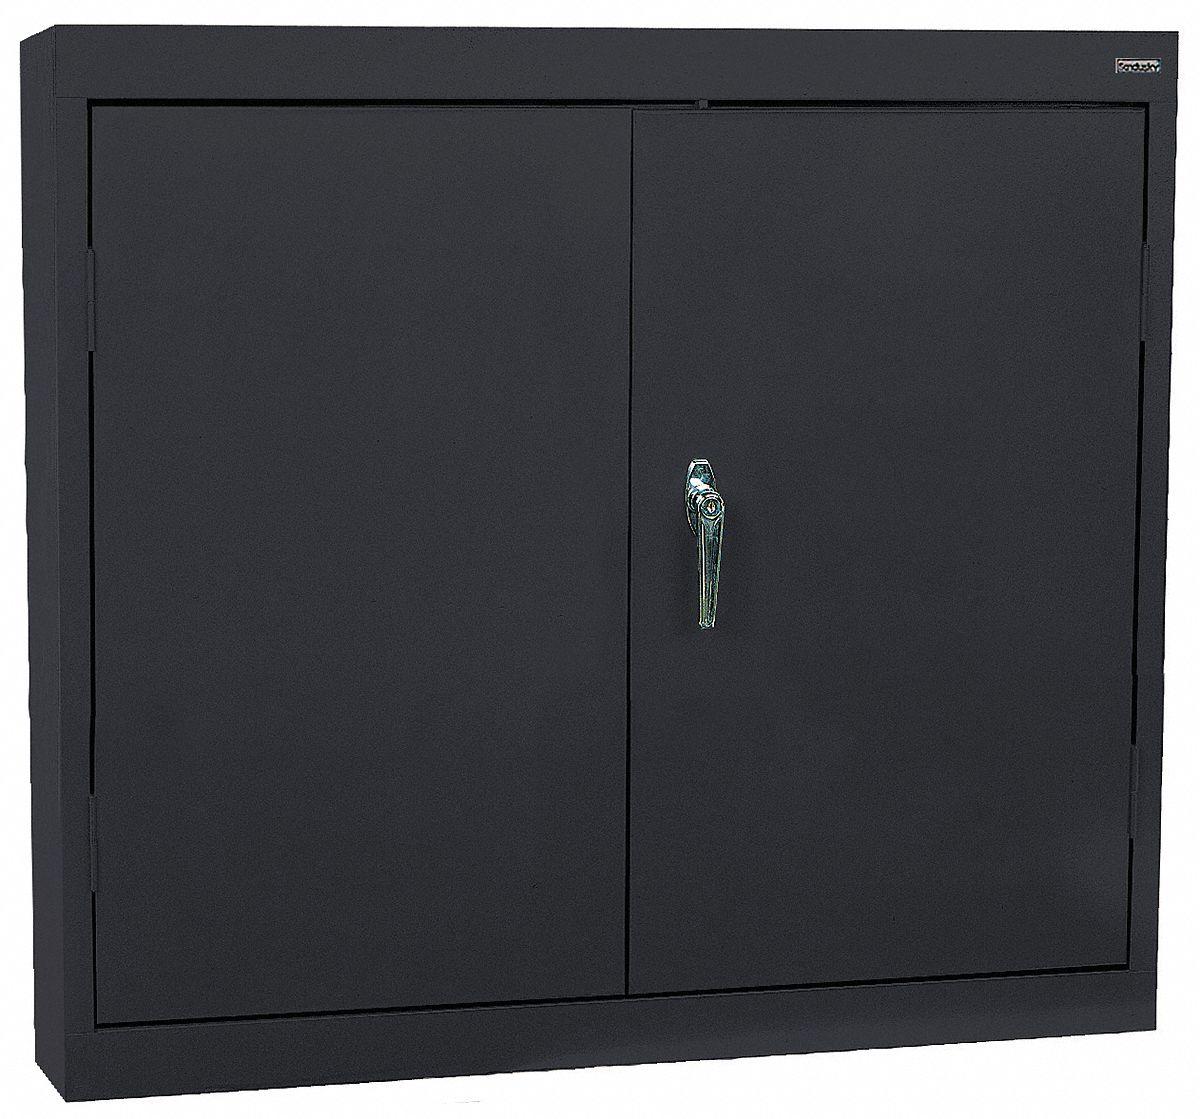 SANDUSKY LEE Black Wall Mount Storage Cabinet 30 Overall Height